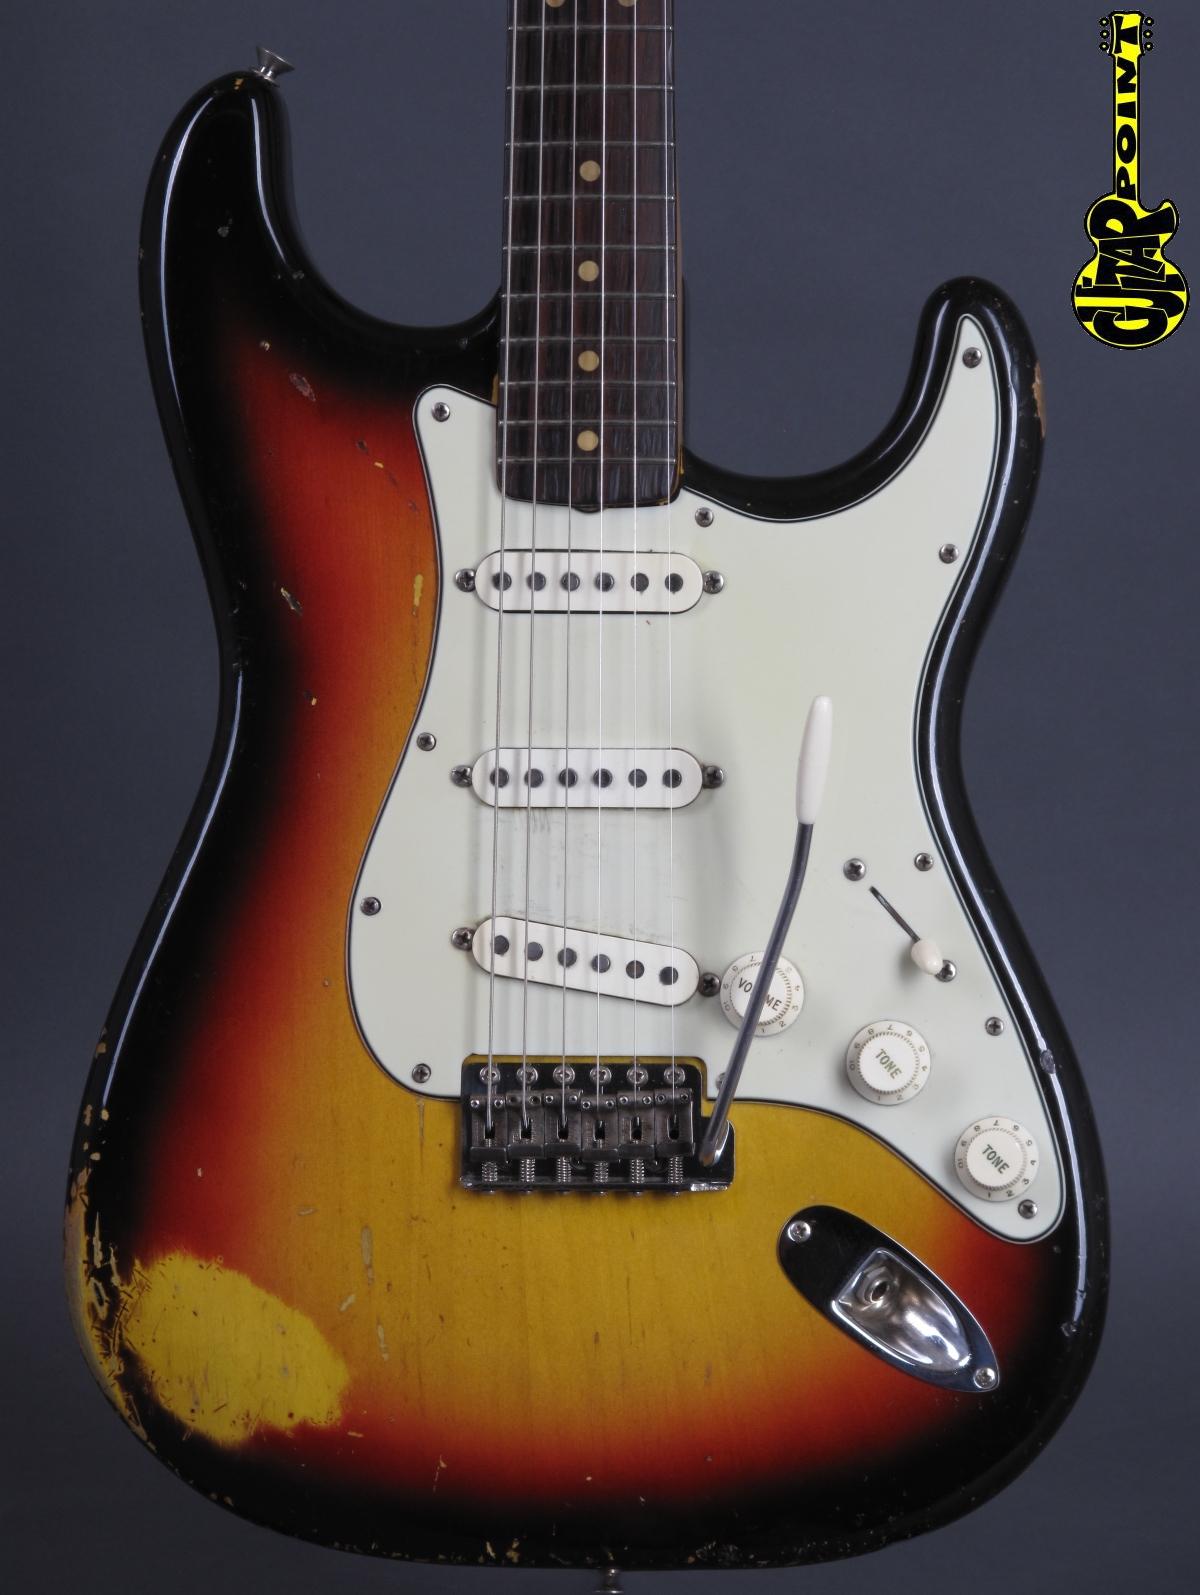 1964 Fender Stratocaster - 3-tone Sunburst   Abigail Yabbara PU´s!